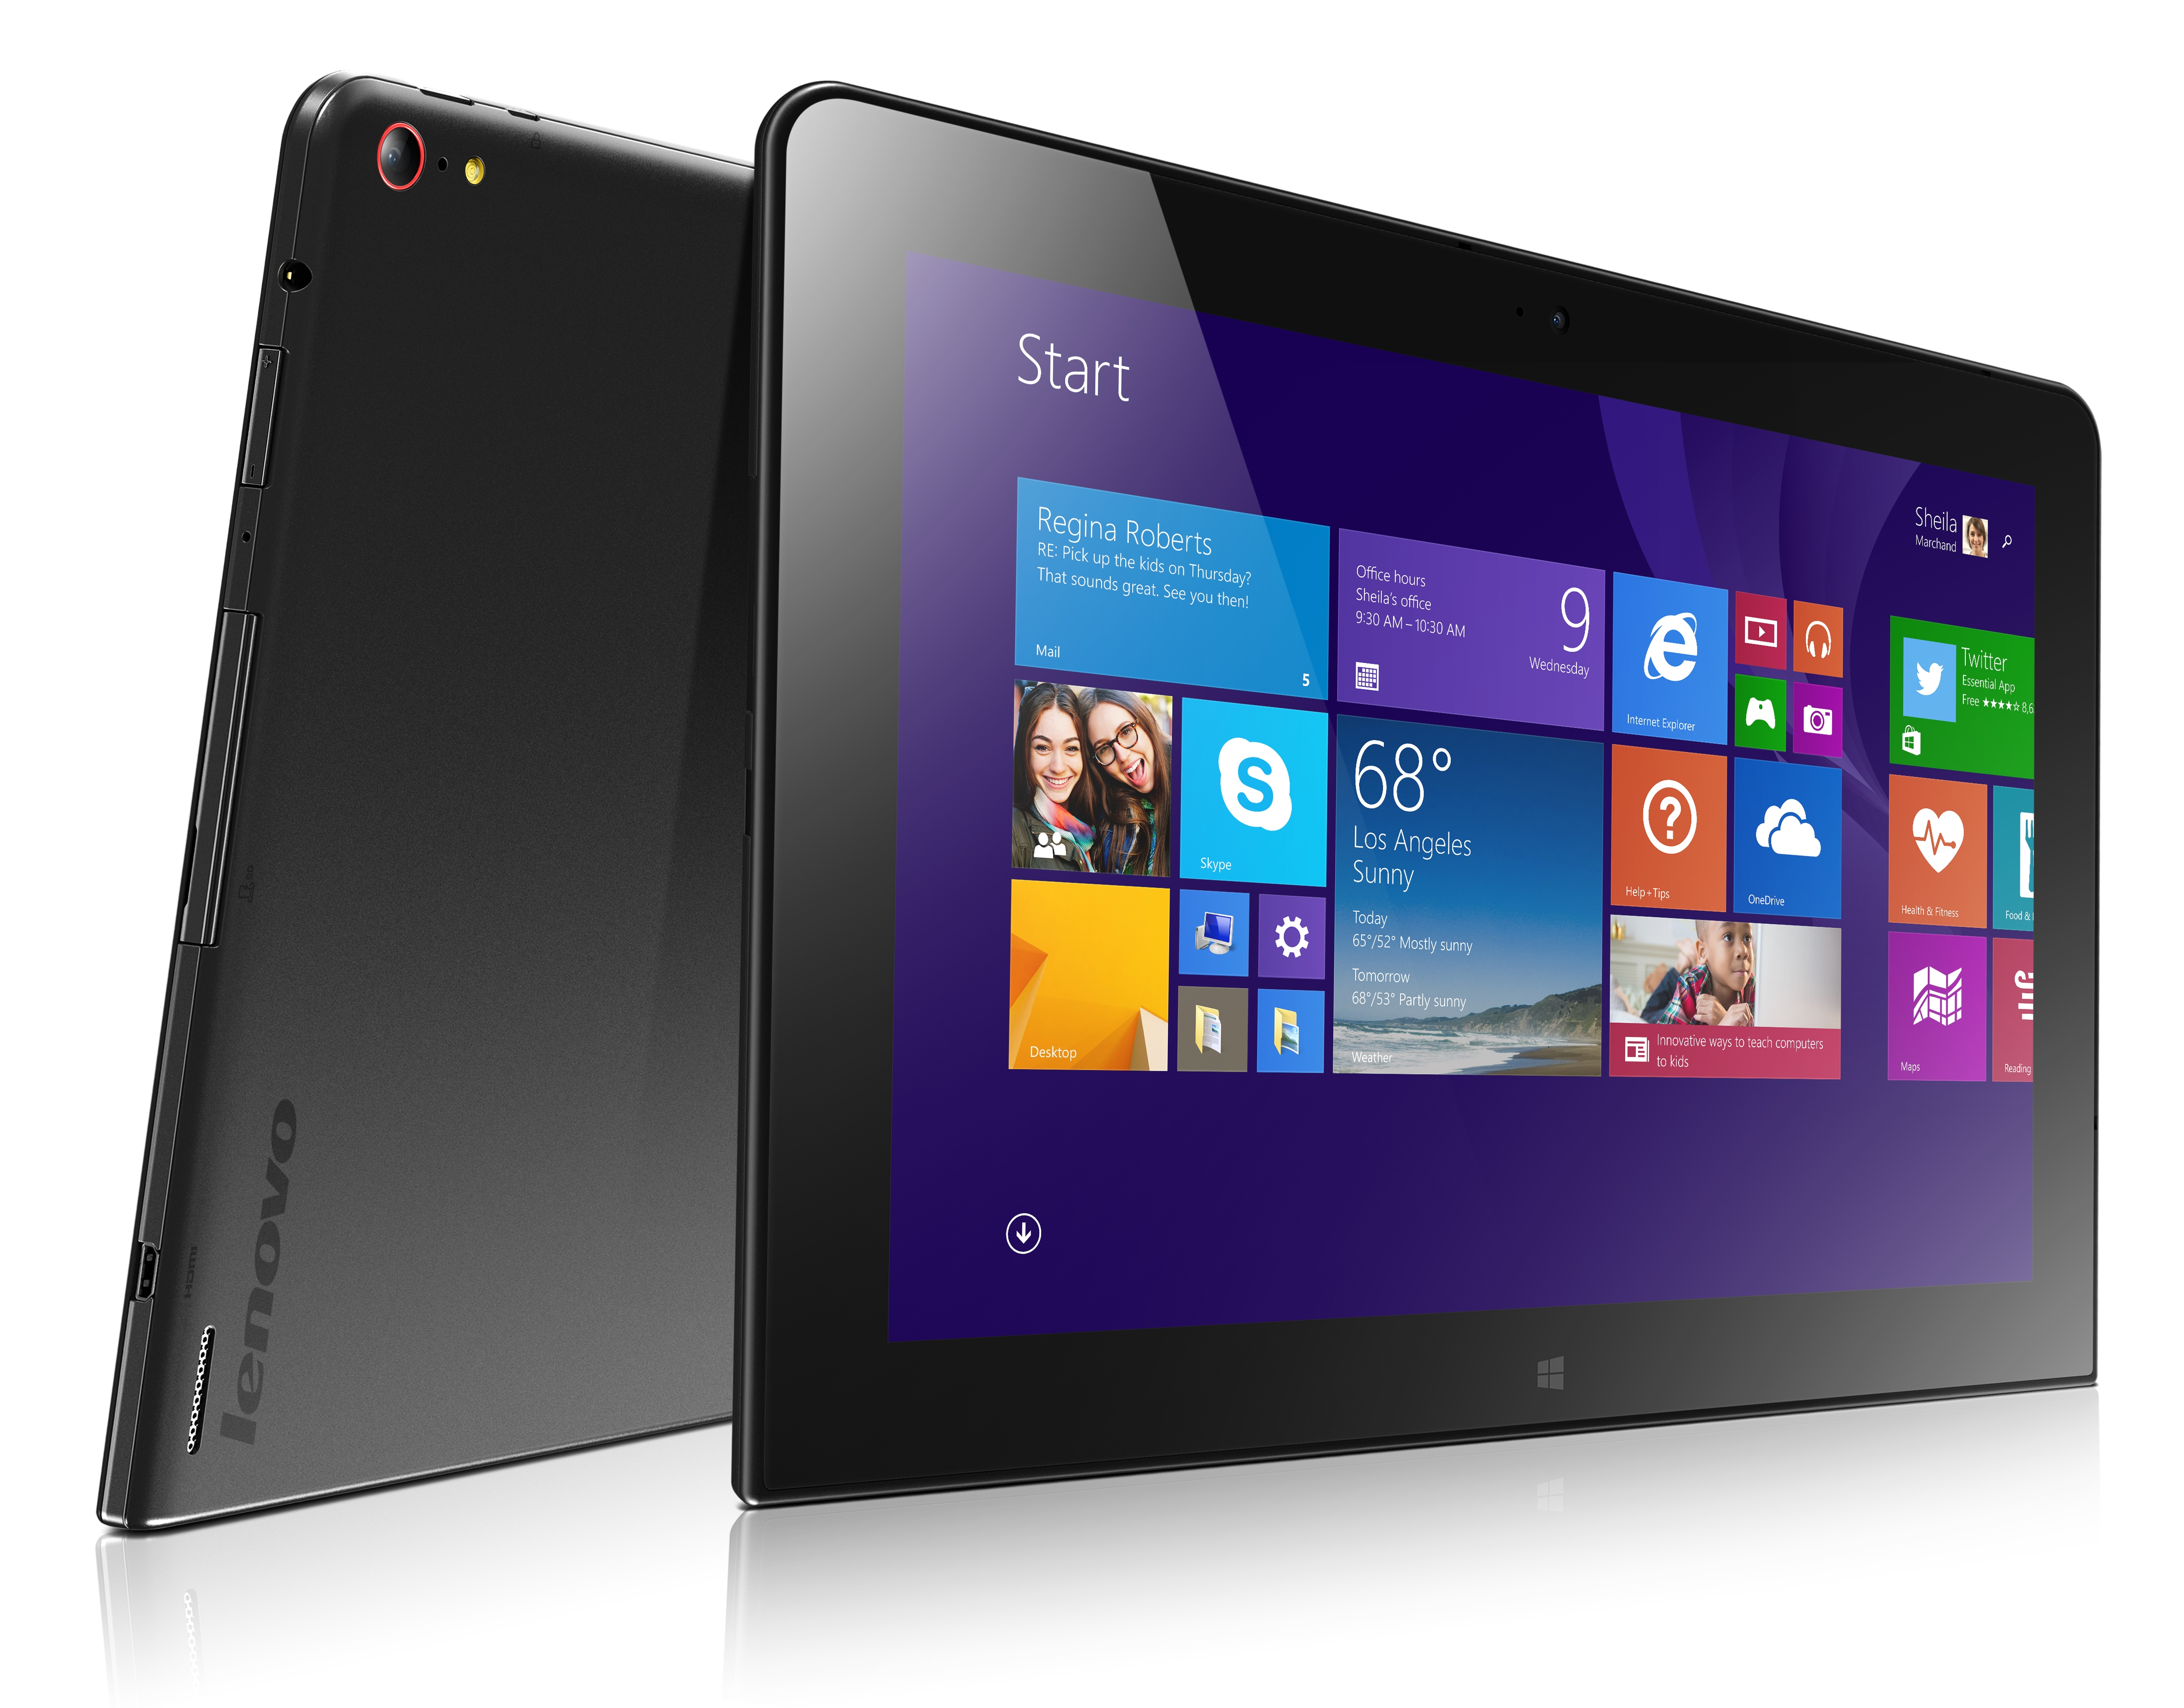 Nowy tablet ThinkPad 10 nareszcie z ekranem FullHD